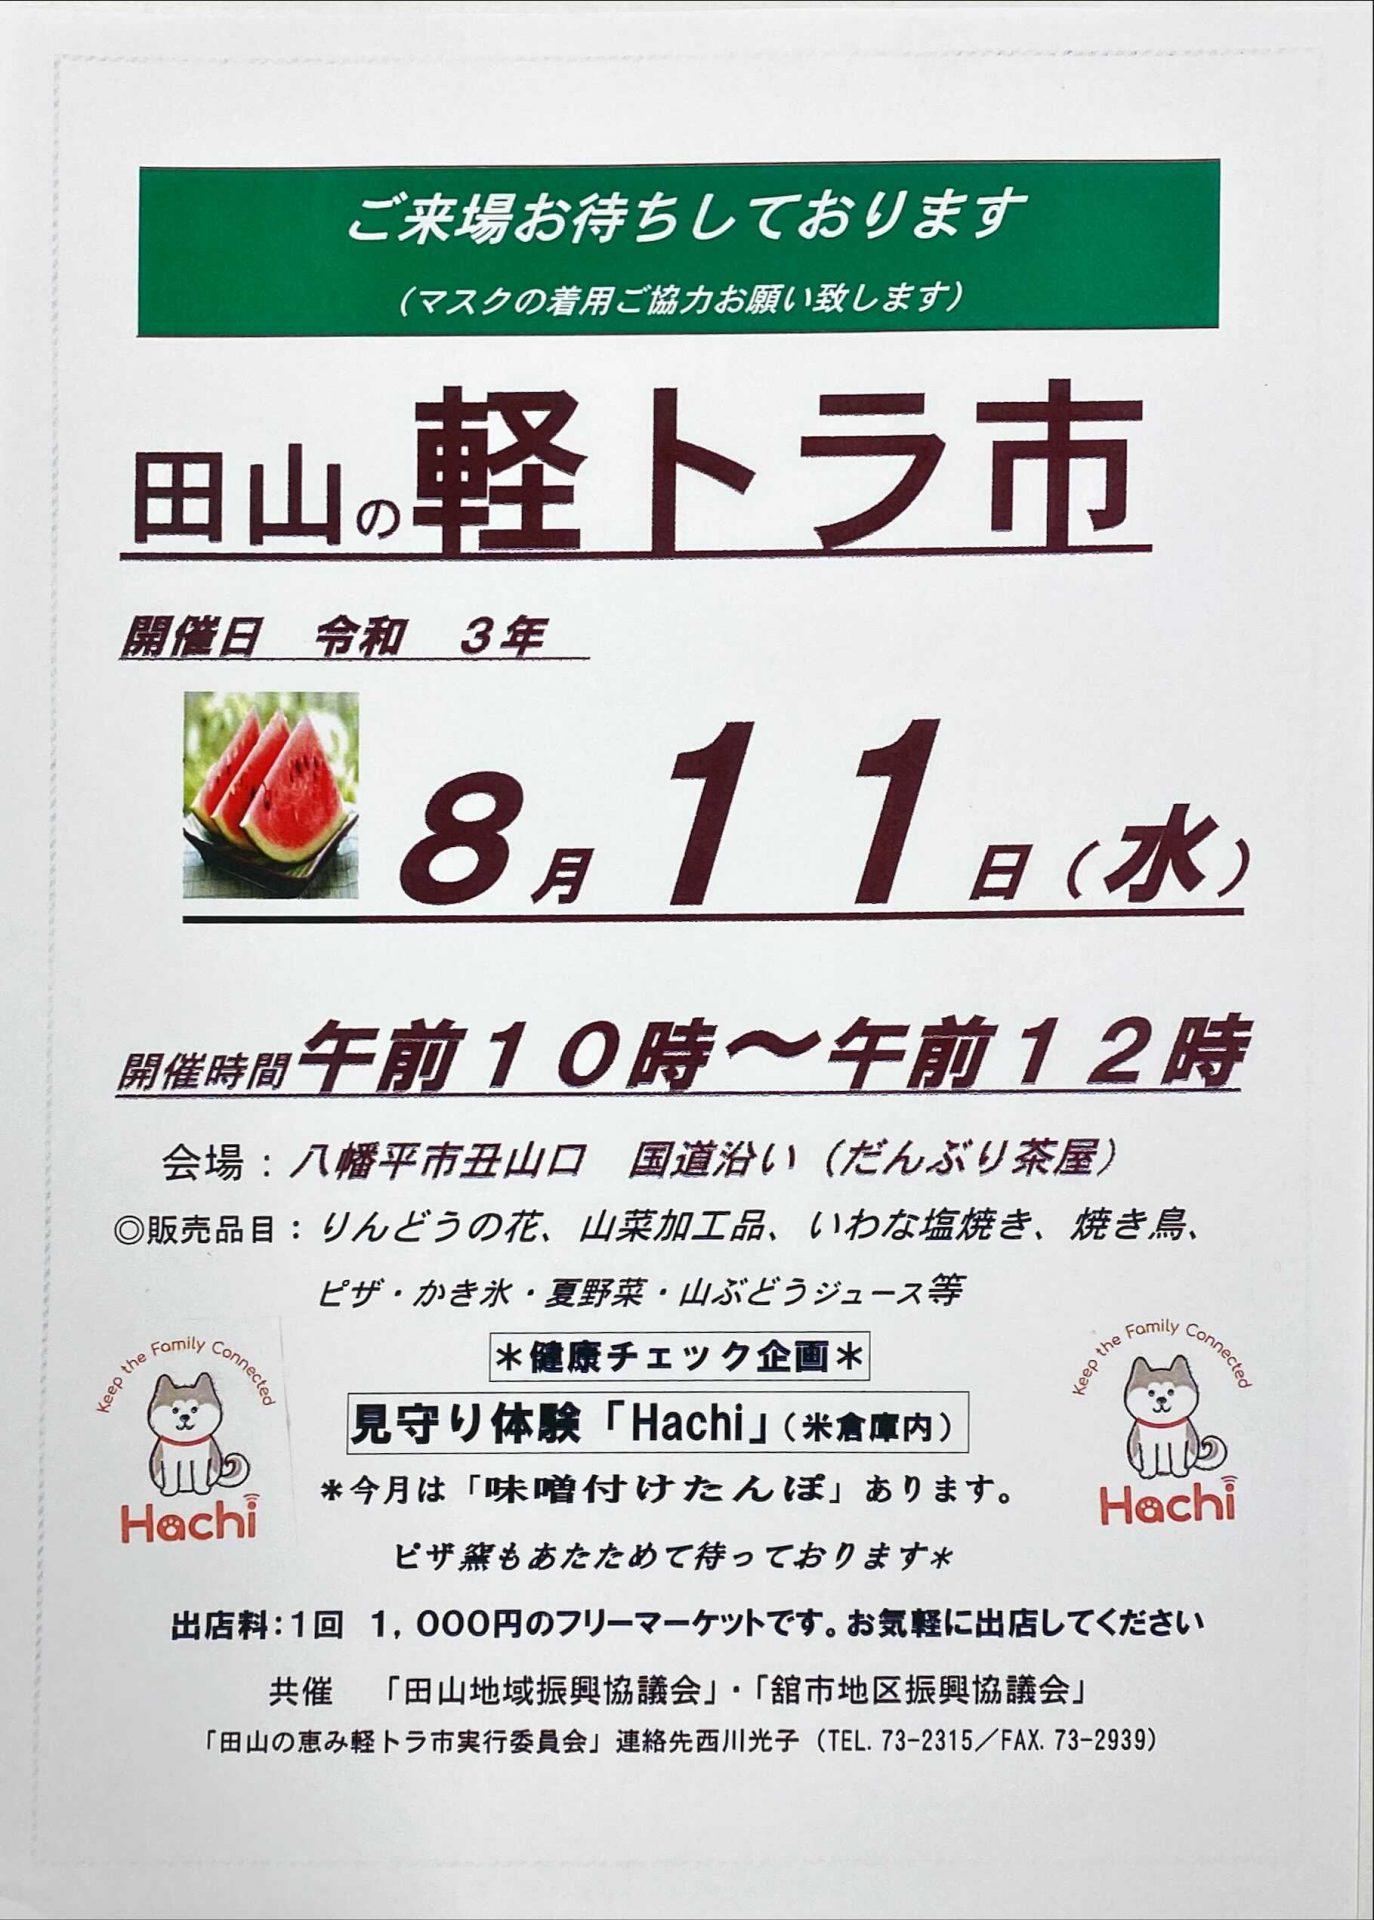 【8MV】8/11(水) 田山現地イベントへ出展します